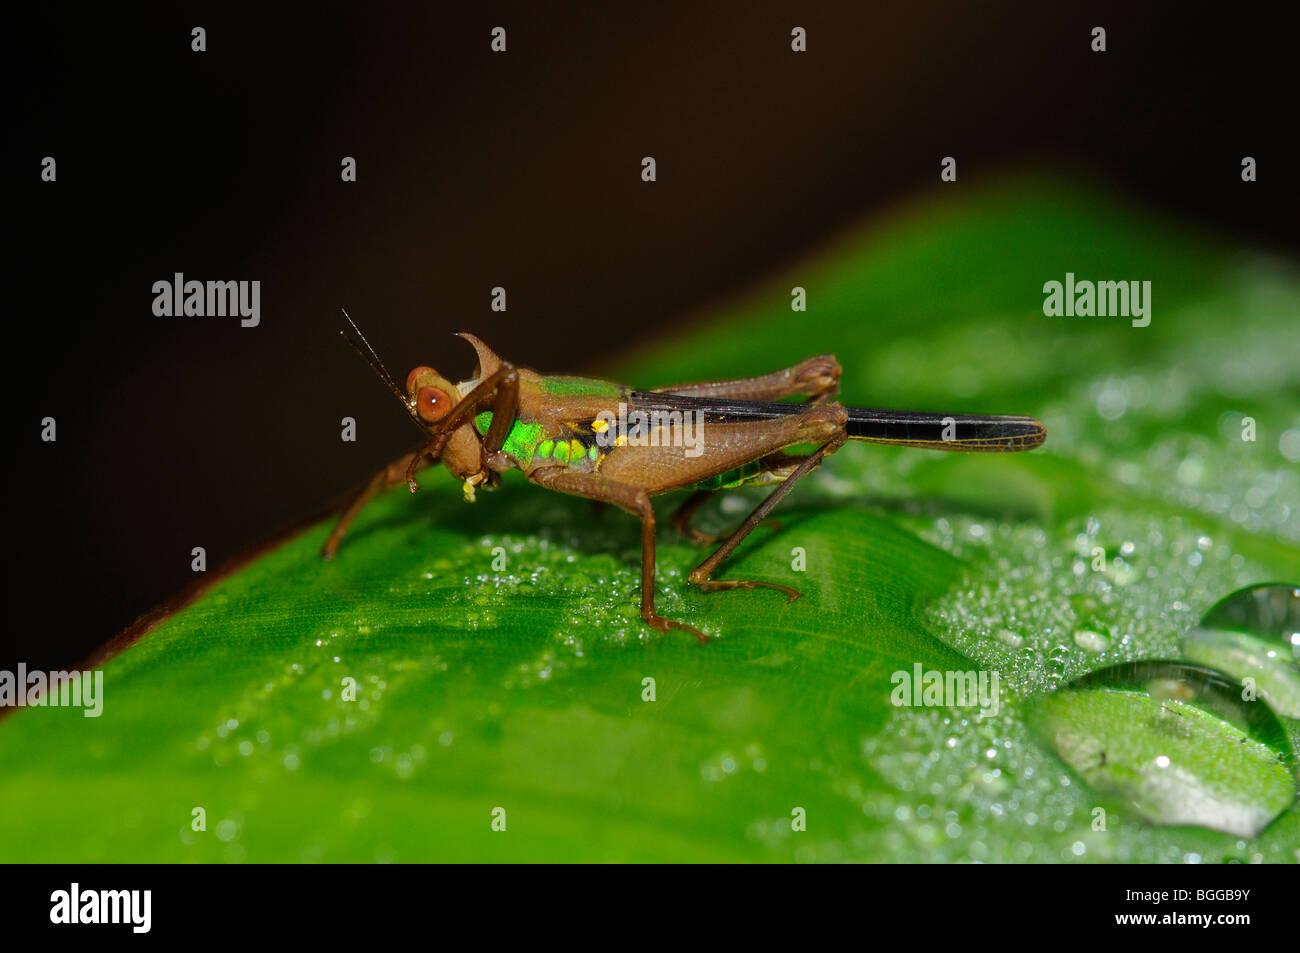 Aeroplane Grasshopper (Eumasticid species) resting on leaf, Alta Floresta, Amazonia, Brazil. - Stock Image